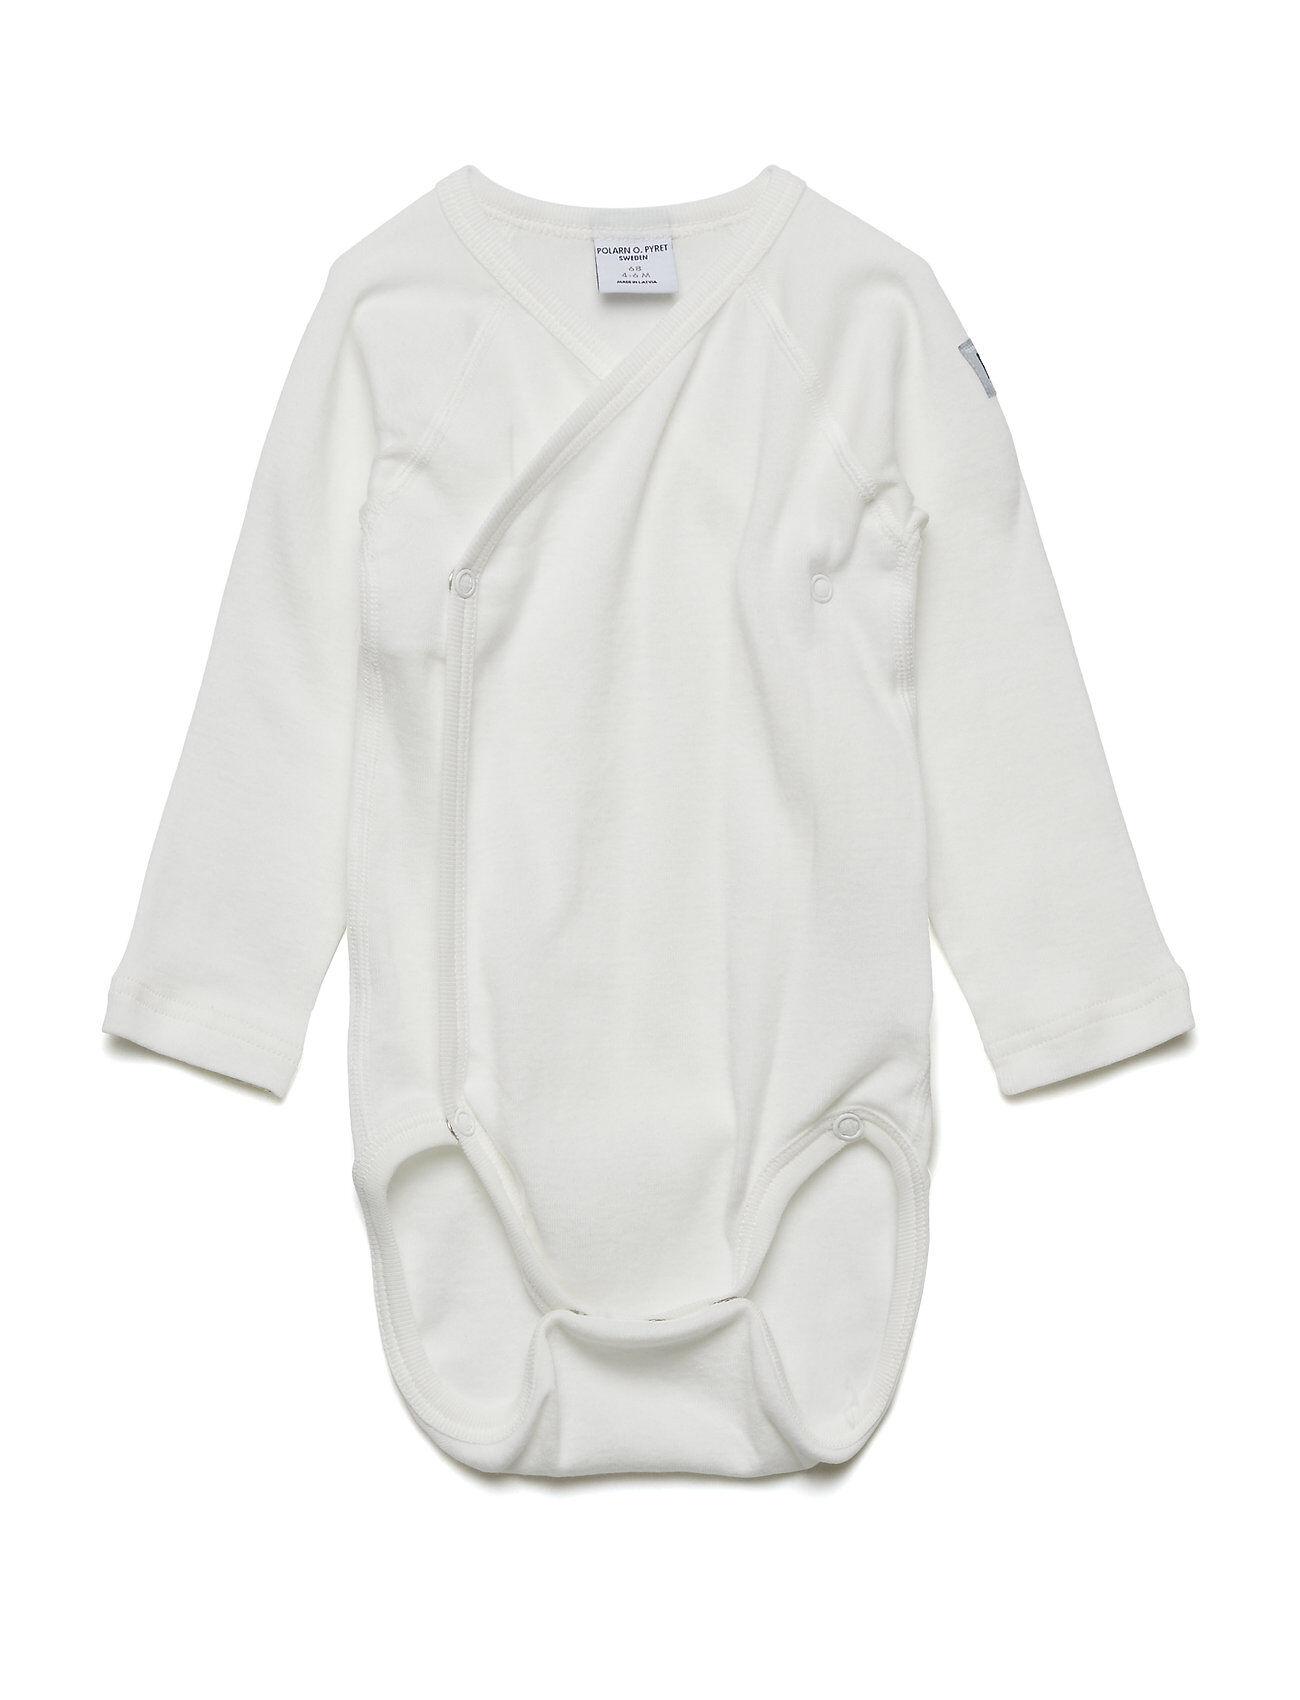 Polarn O. Pyret Body Wrapover Solid Newborn